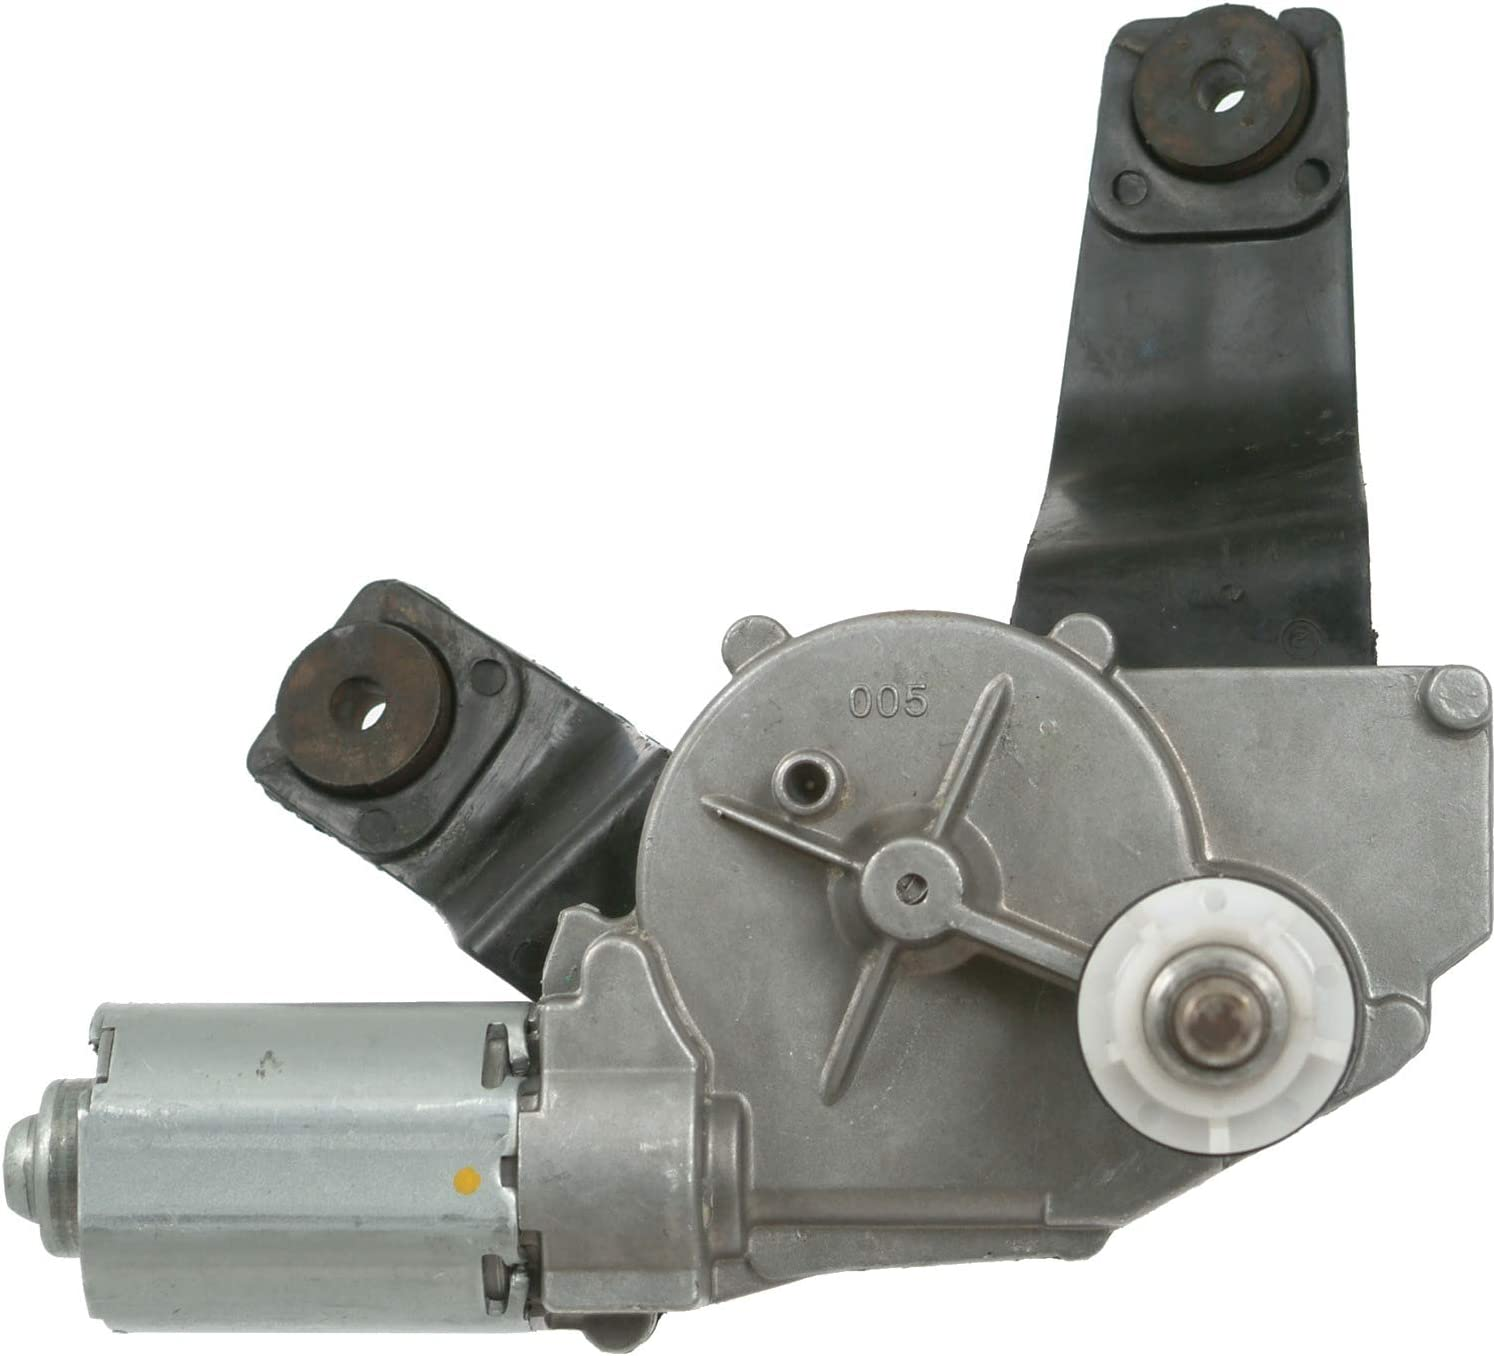 Cardone 43-4596 Remanufactured Import Wiper Motor